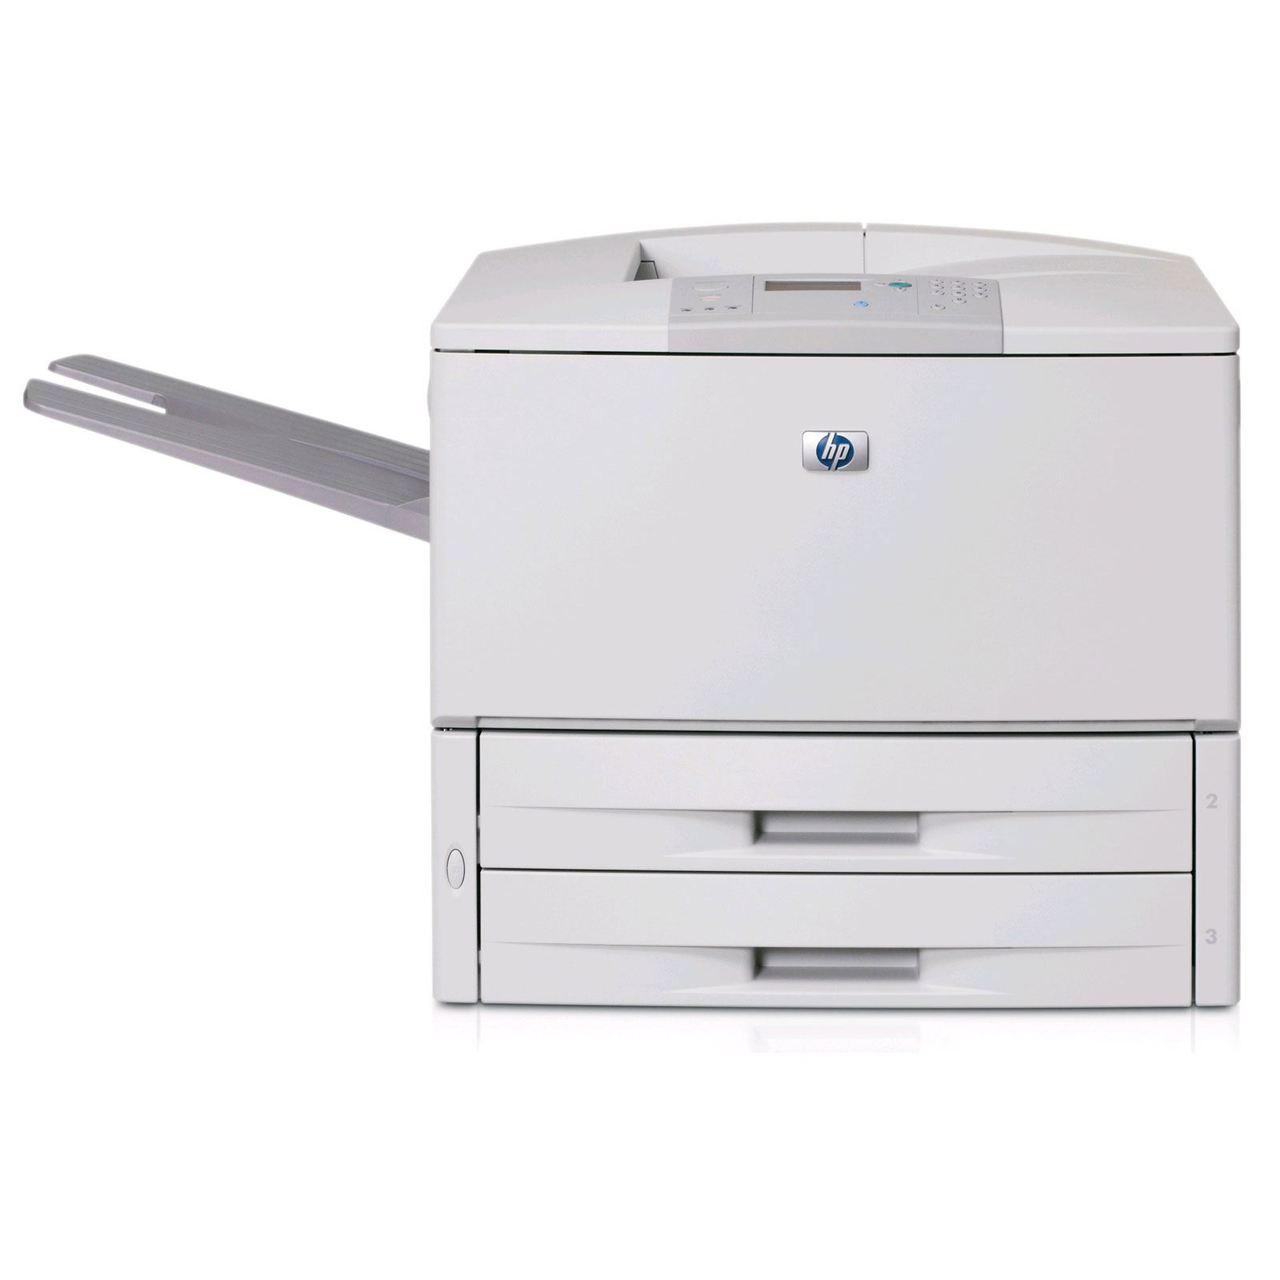 Hp hp color laser printers 11x17 - Hp Laserjet 9040n Q7698a Hp 11x17 Laser Printer For Sale